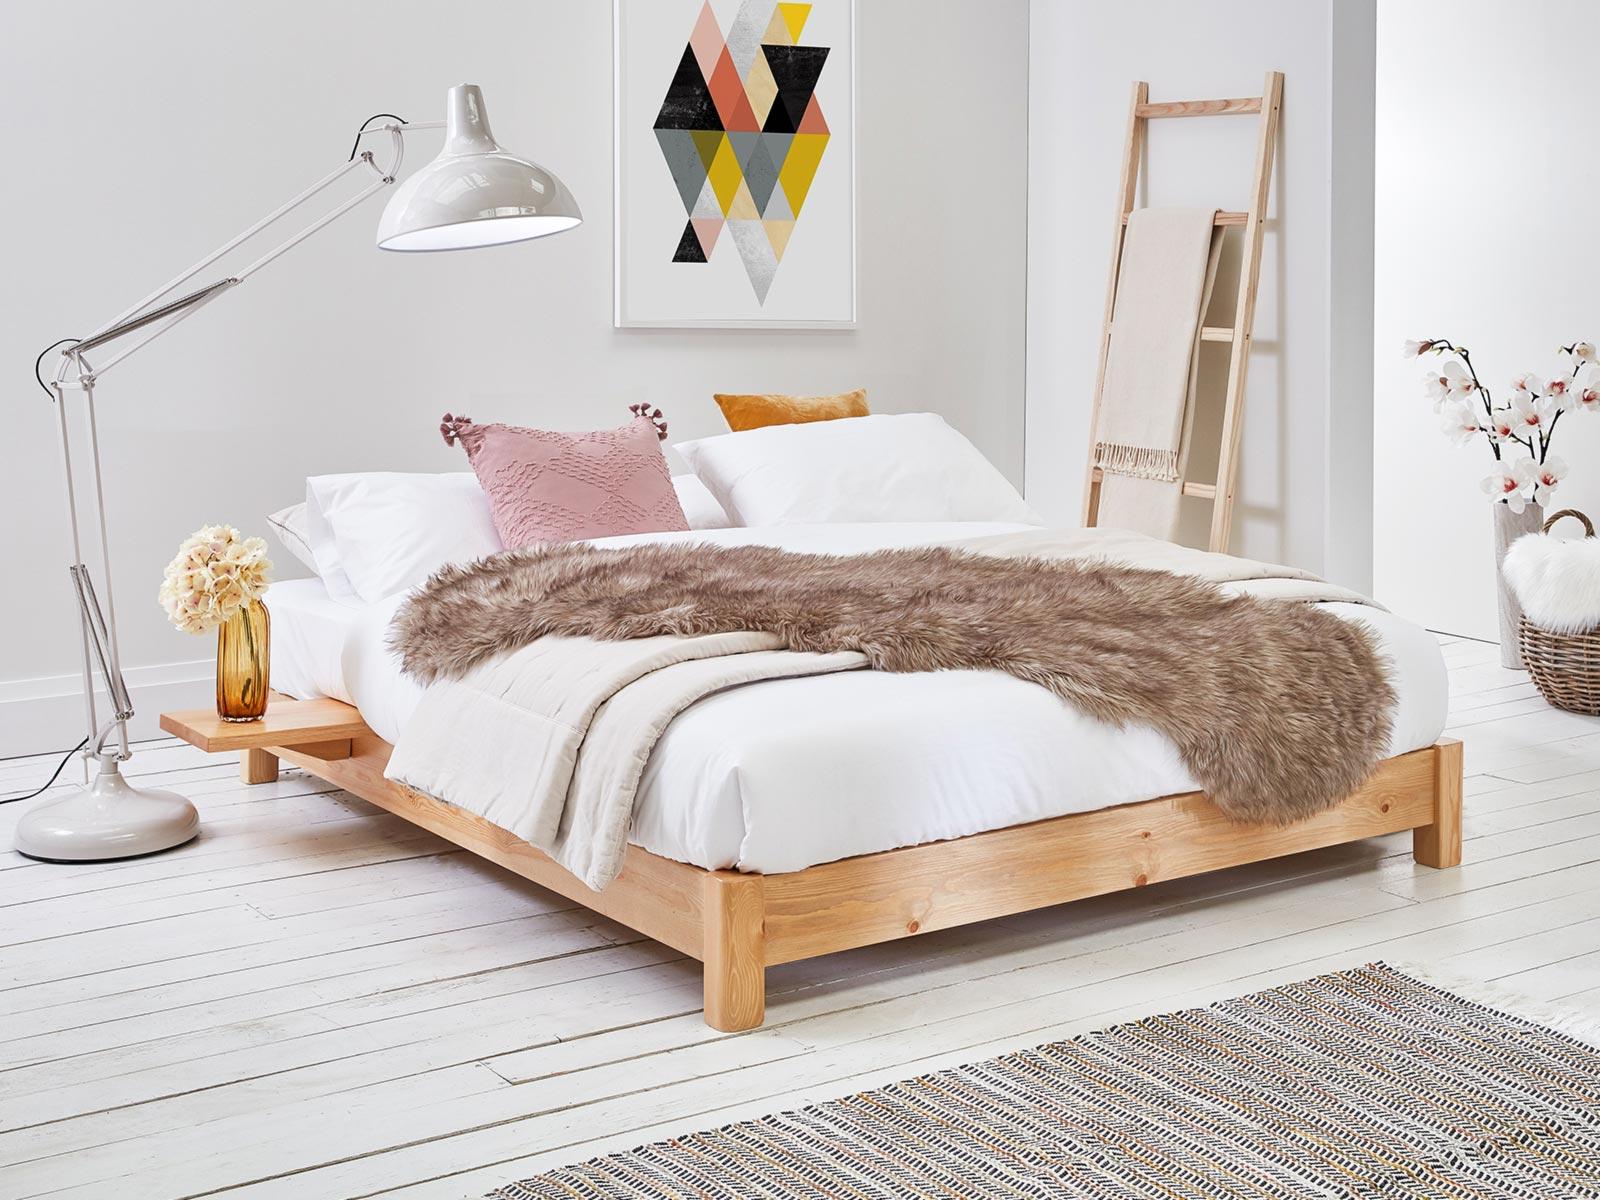 Low Platform Bed Space Saver Get Laid Beds